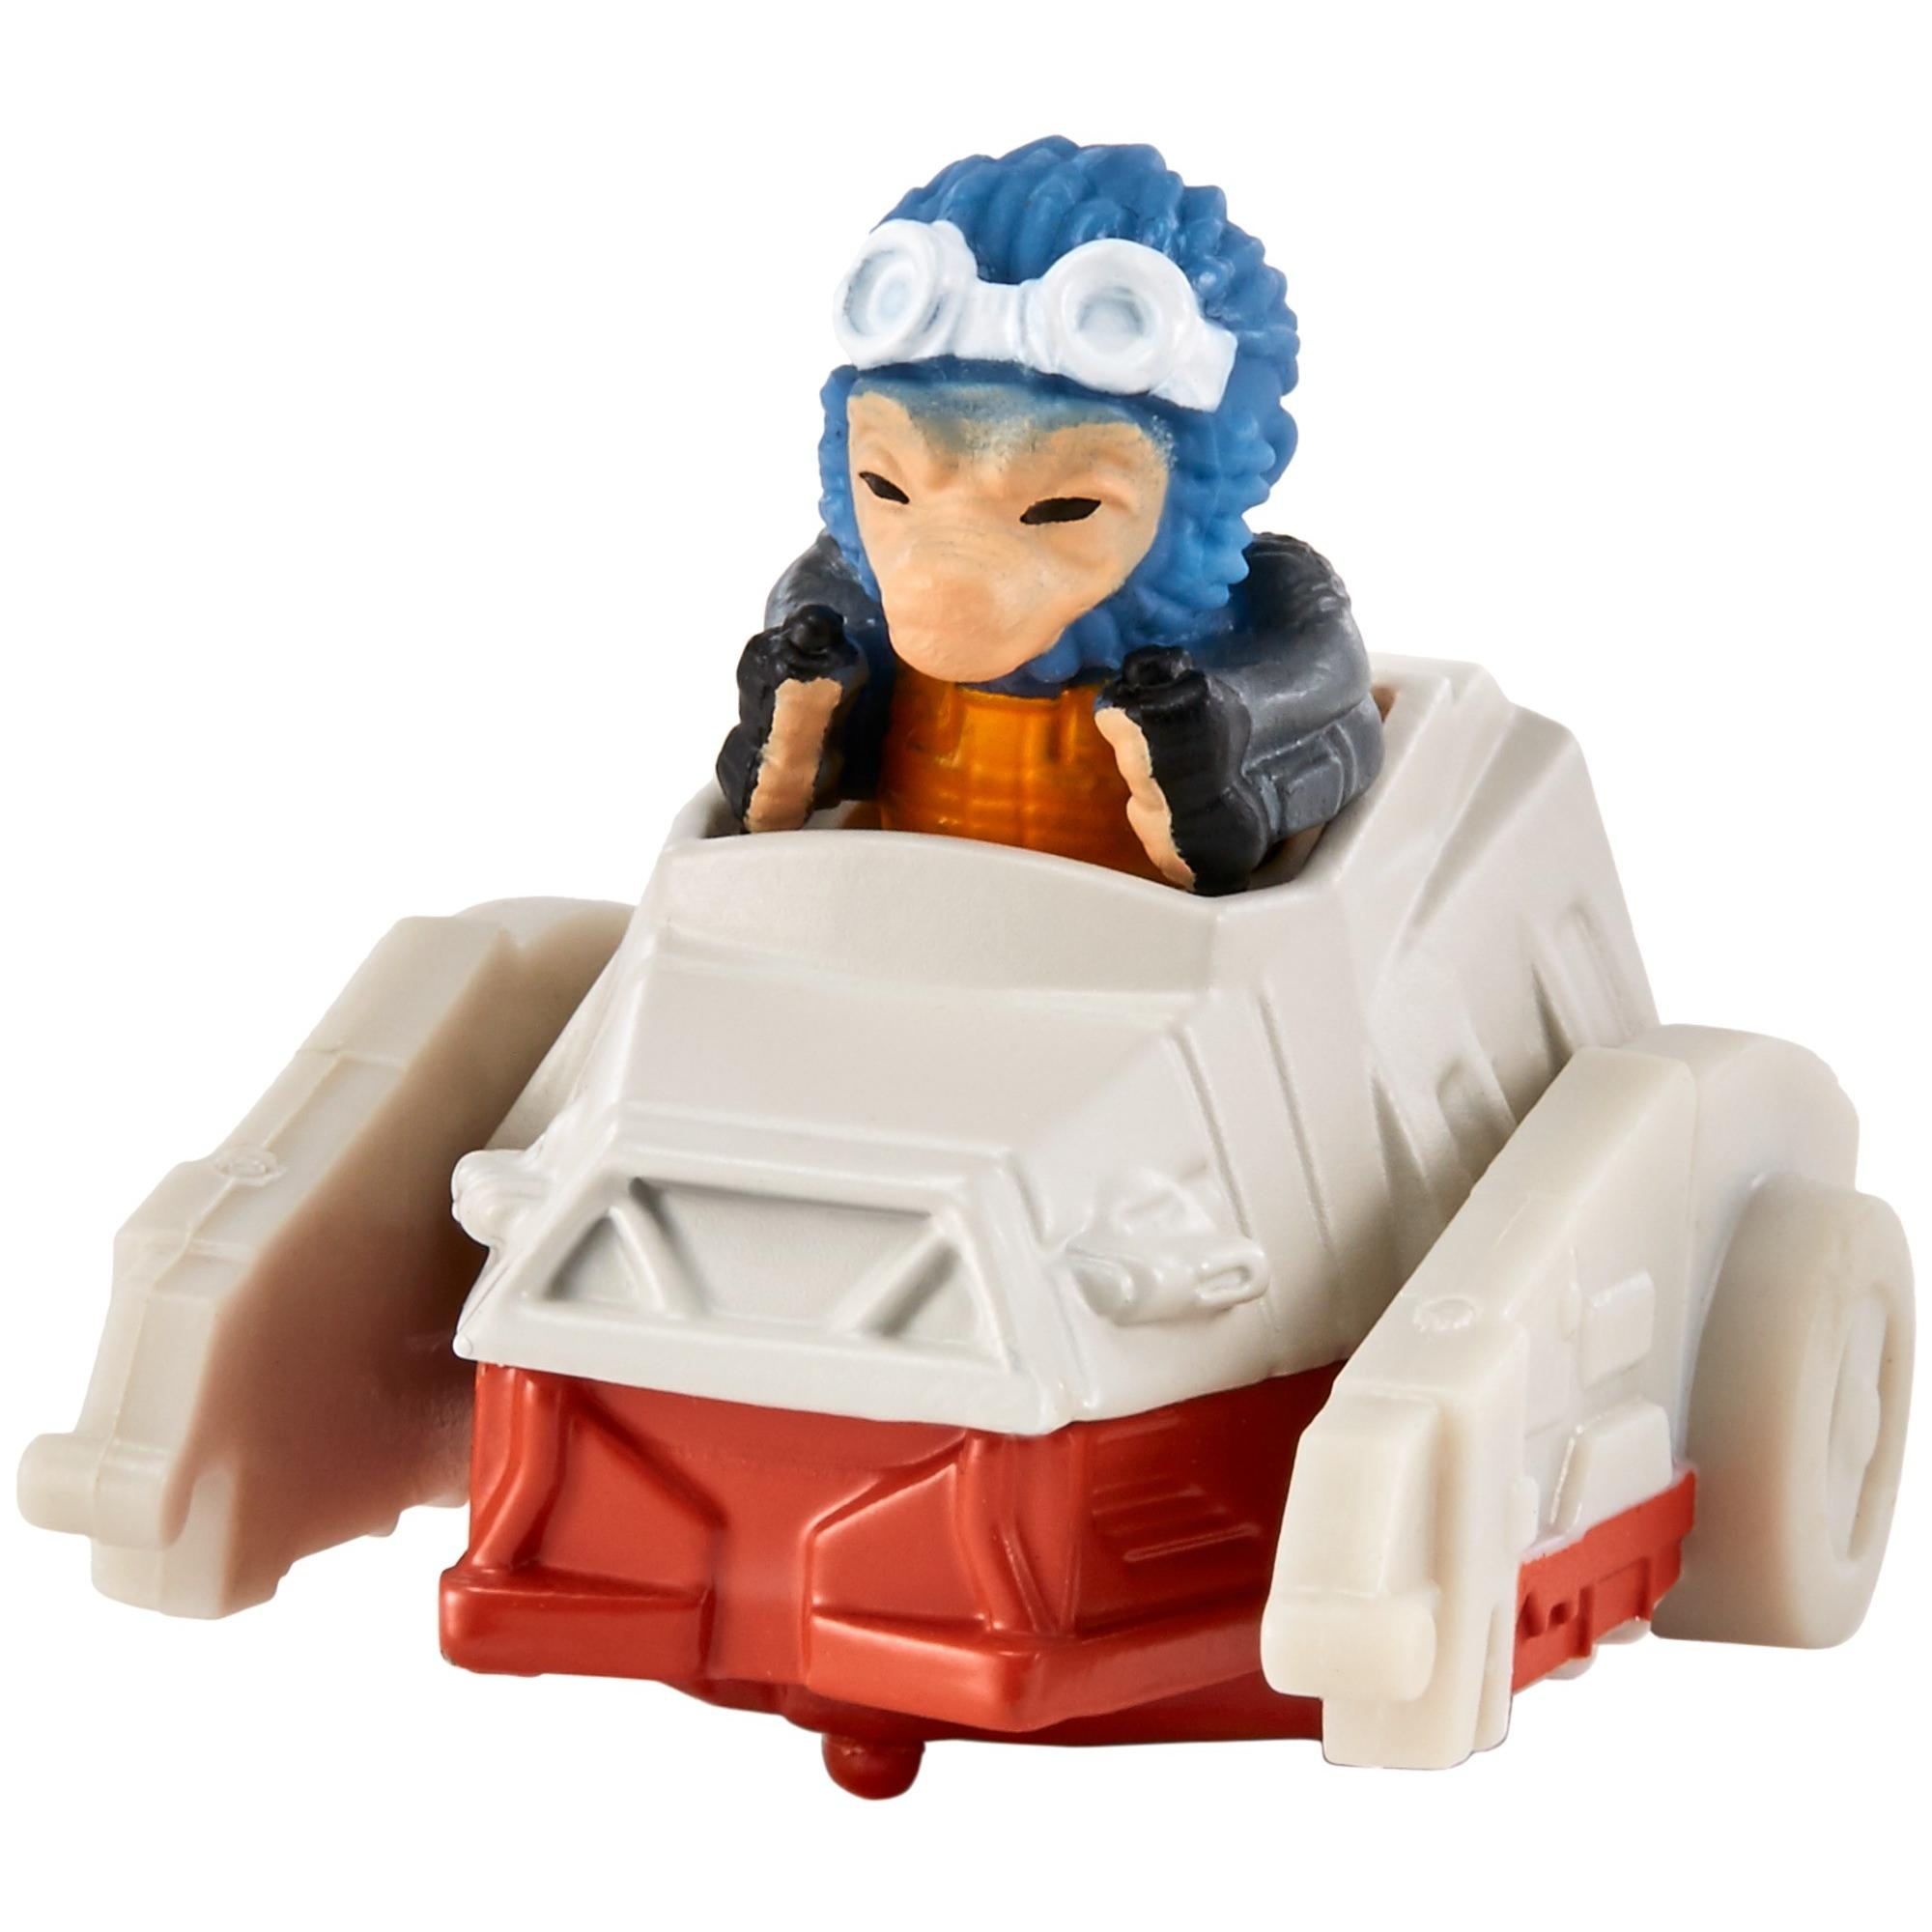 Solo: ASWS Rio Monkey, Quad Hauler Battle Roller Toy 2